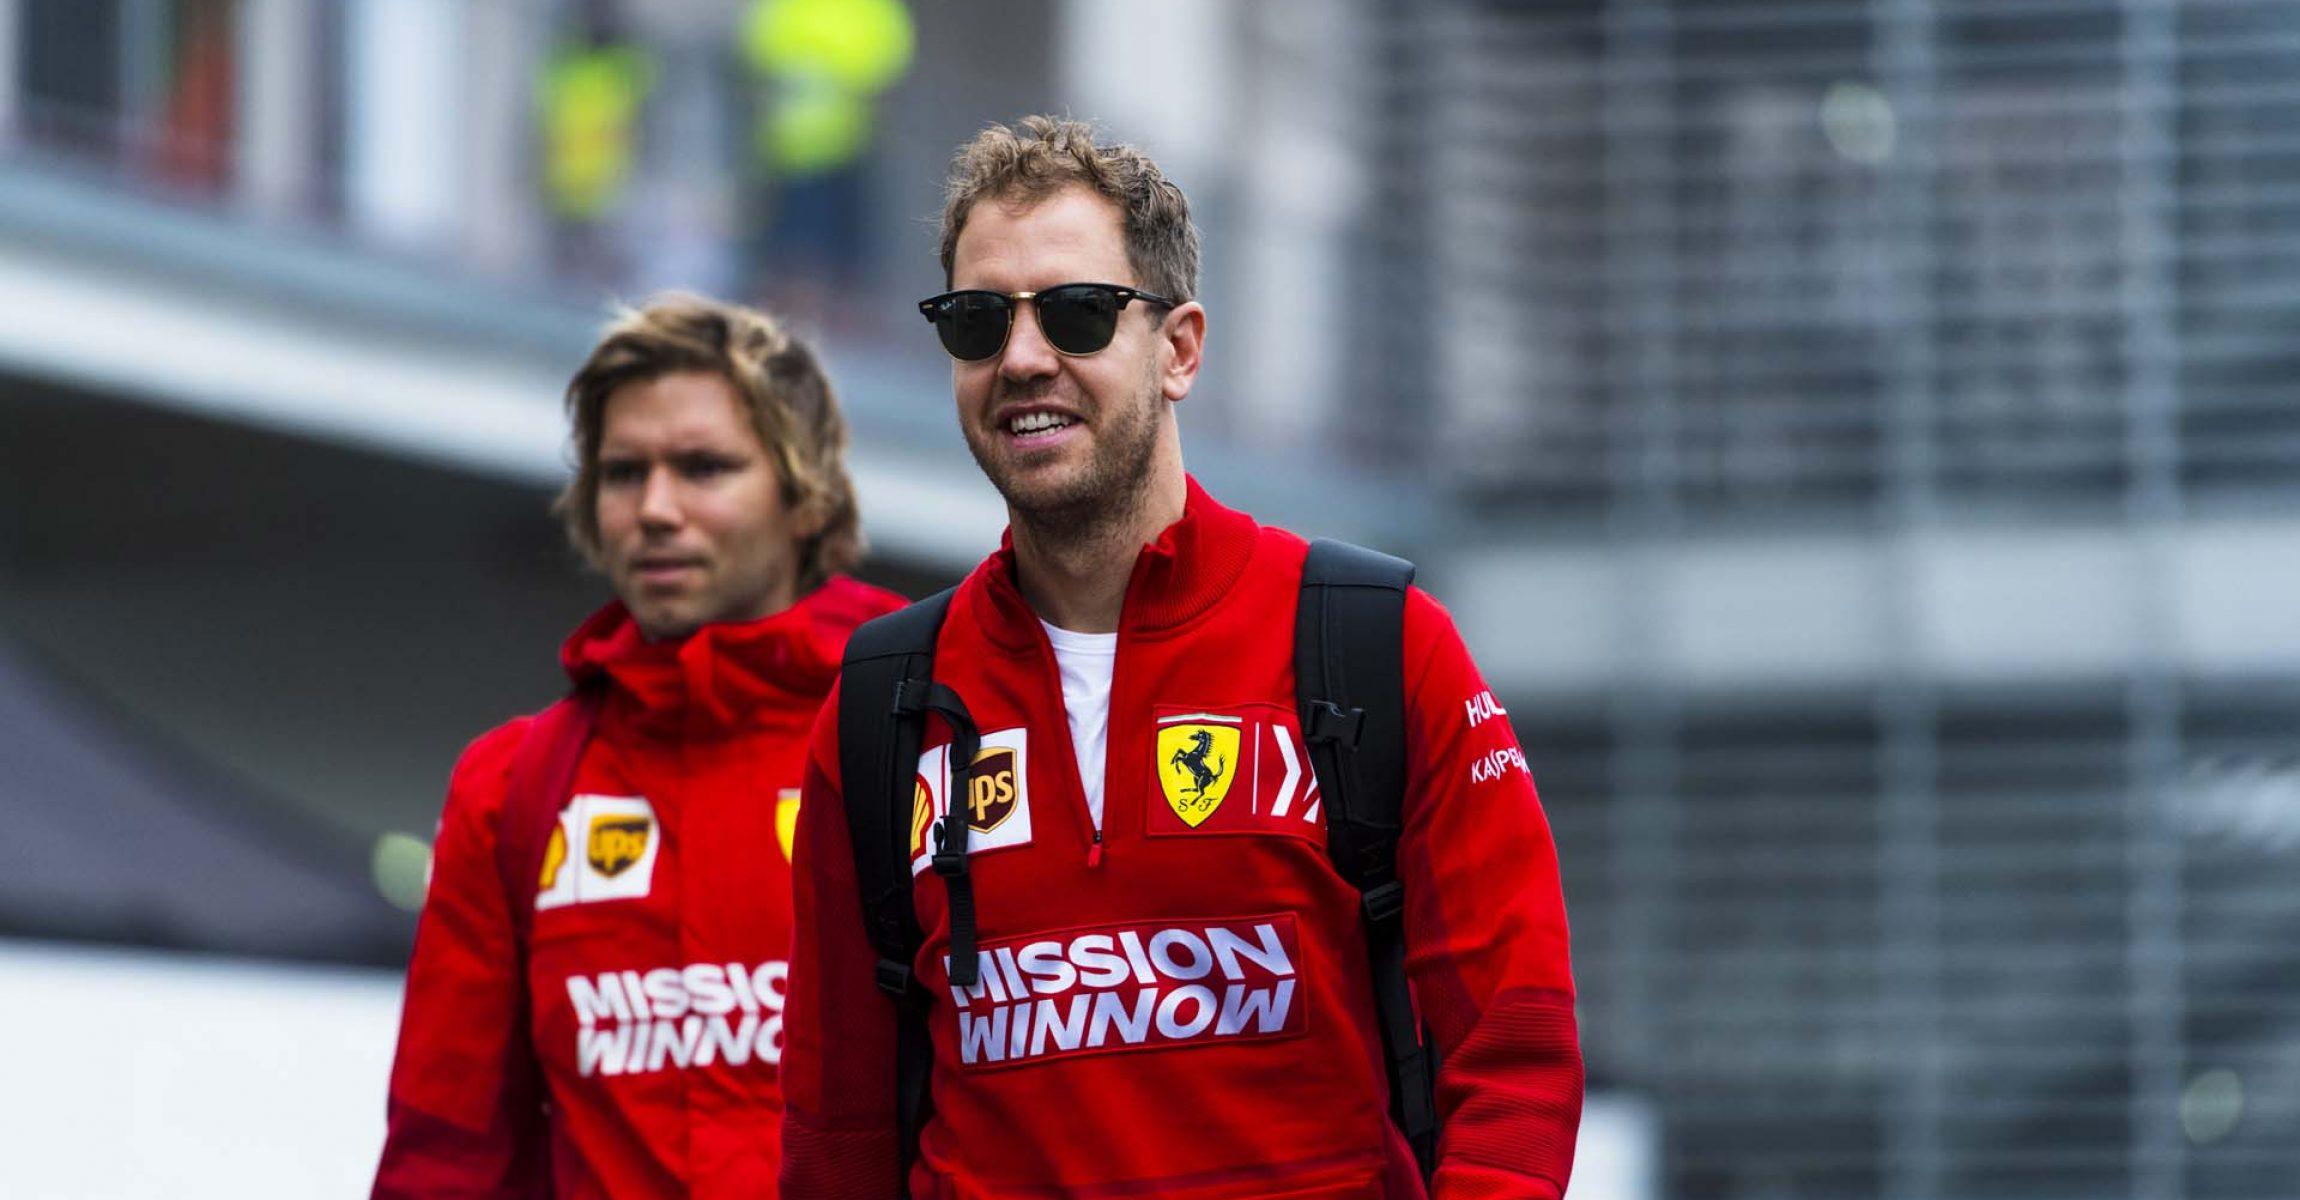 Sebastian Vettel, Ferrari, Antti Kontsas, phisyo